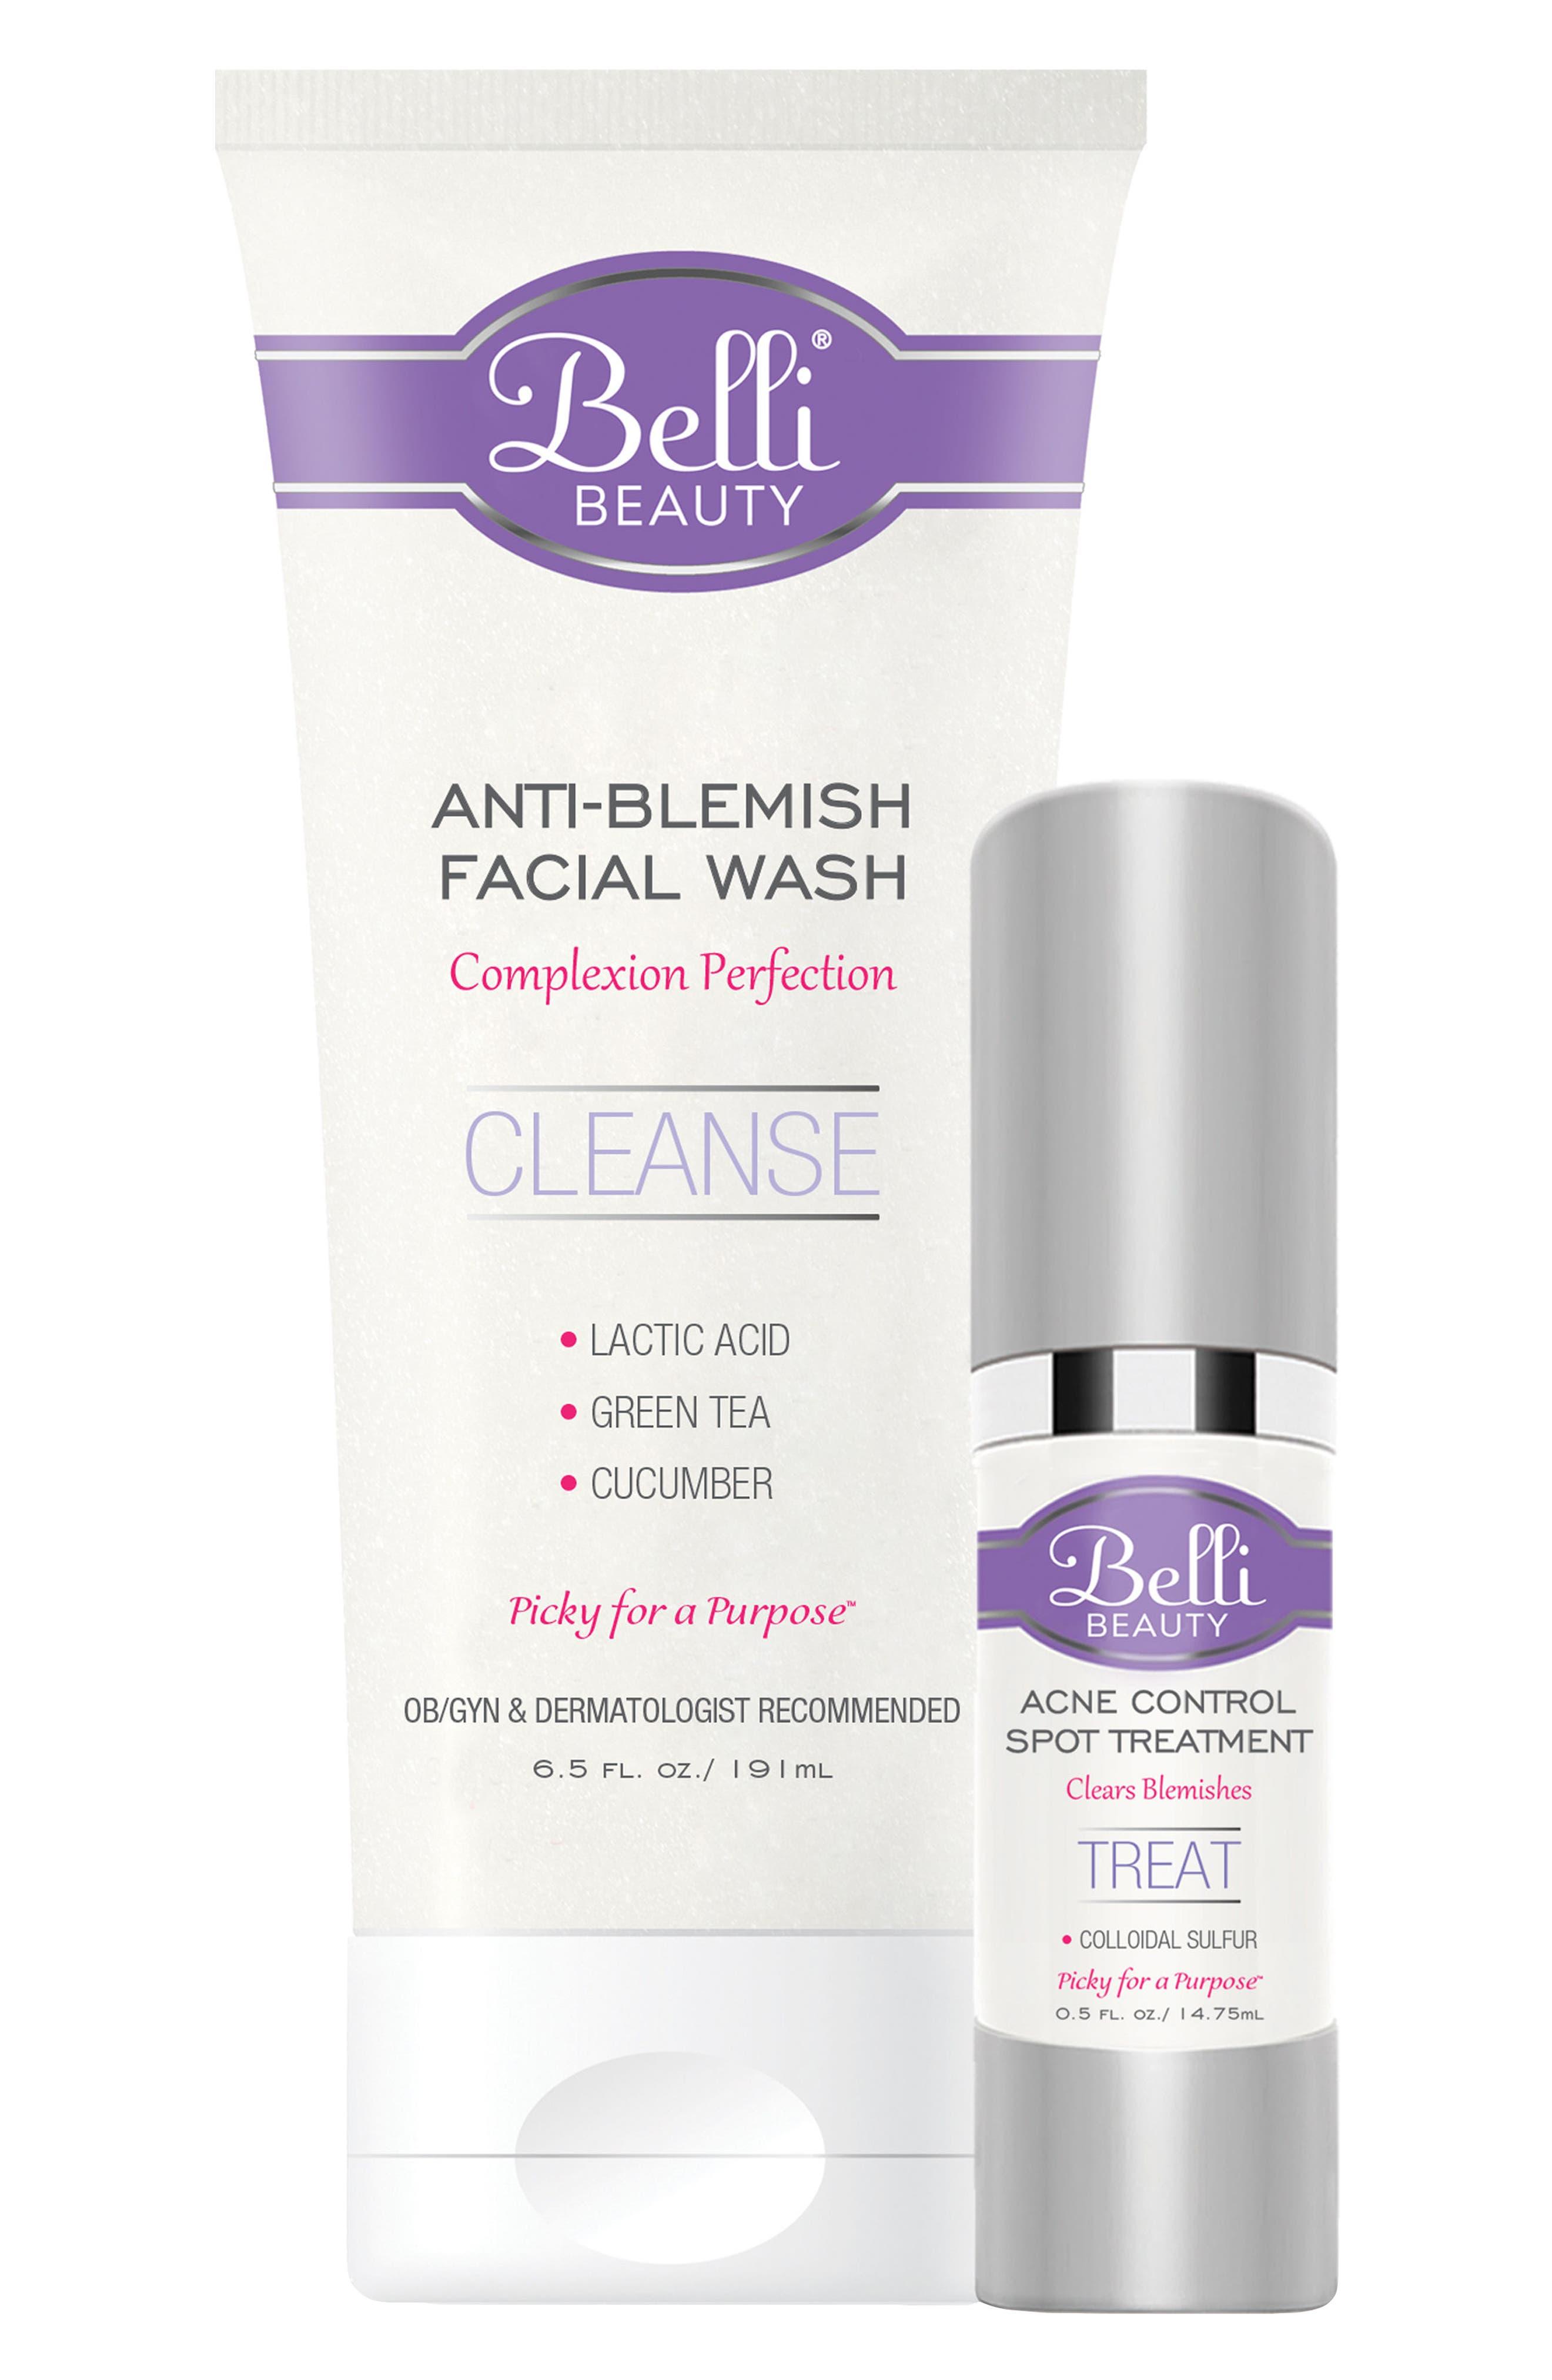 Main Image - Belli Skincare Maternity Anti-Blemish Basics with Anti-Blemish Facial Wash (6.5 oz.) & Acne Control Spot Treatment (1.5 oz.)